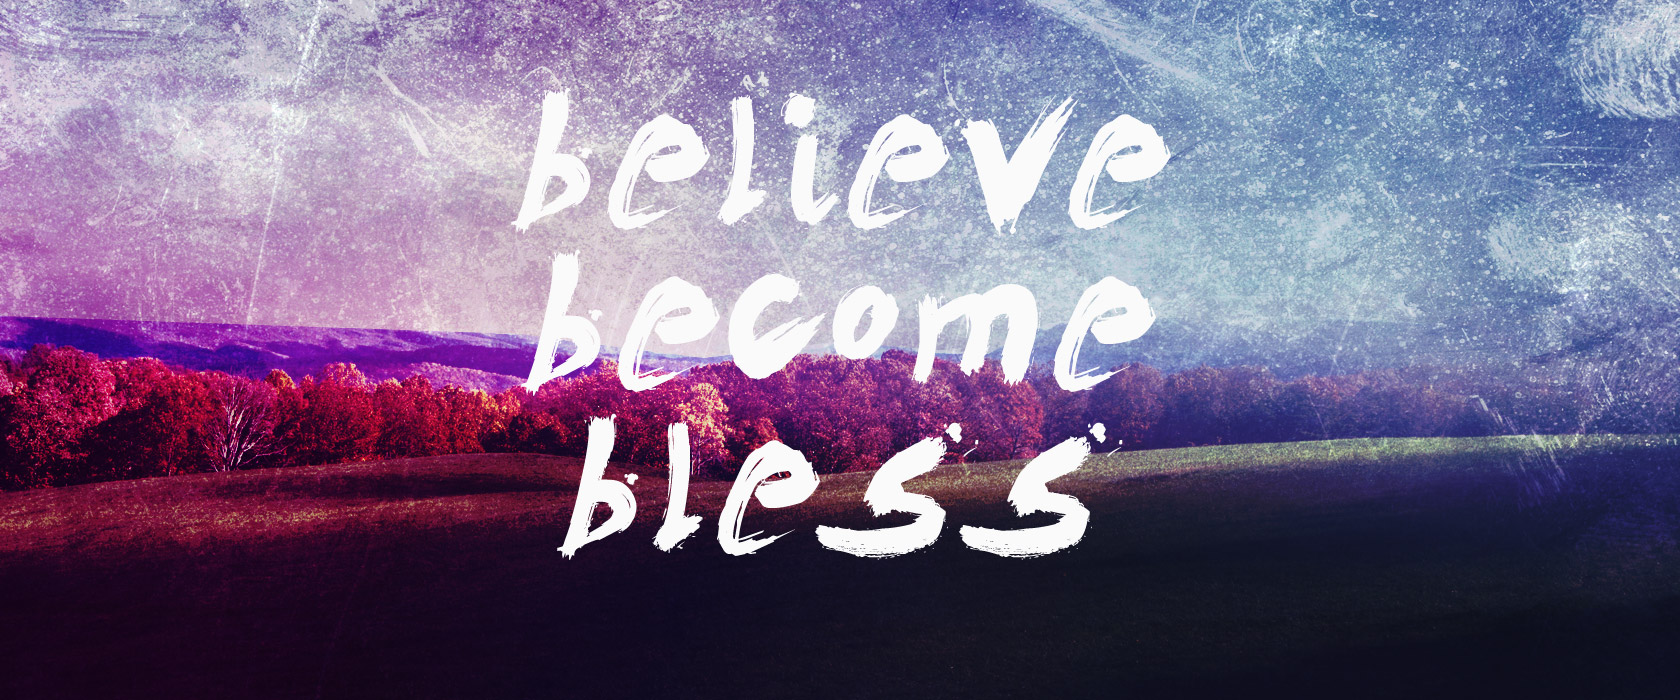 believebecomebless_webbanner2015